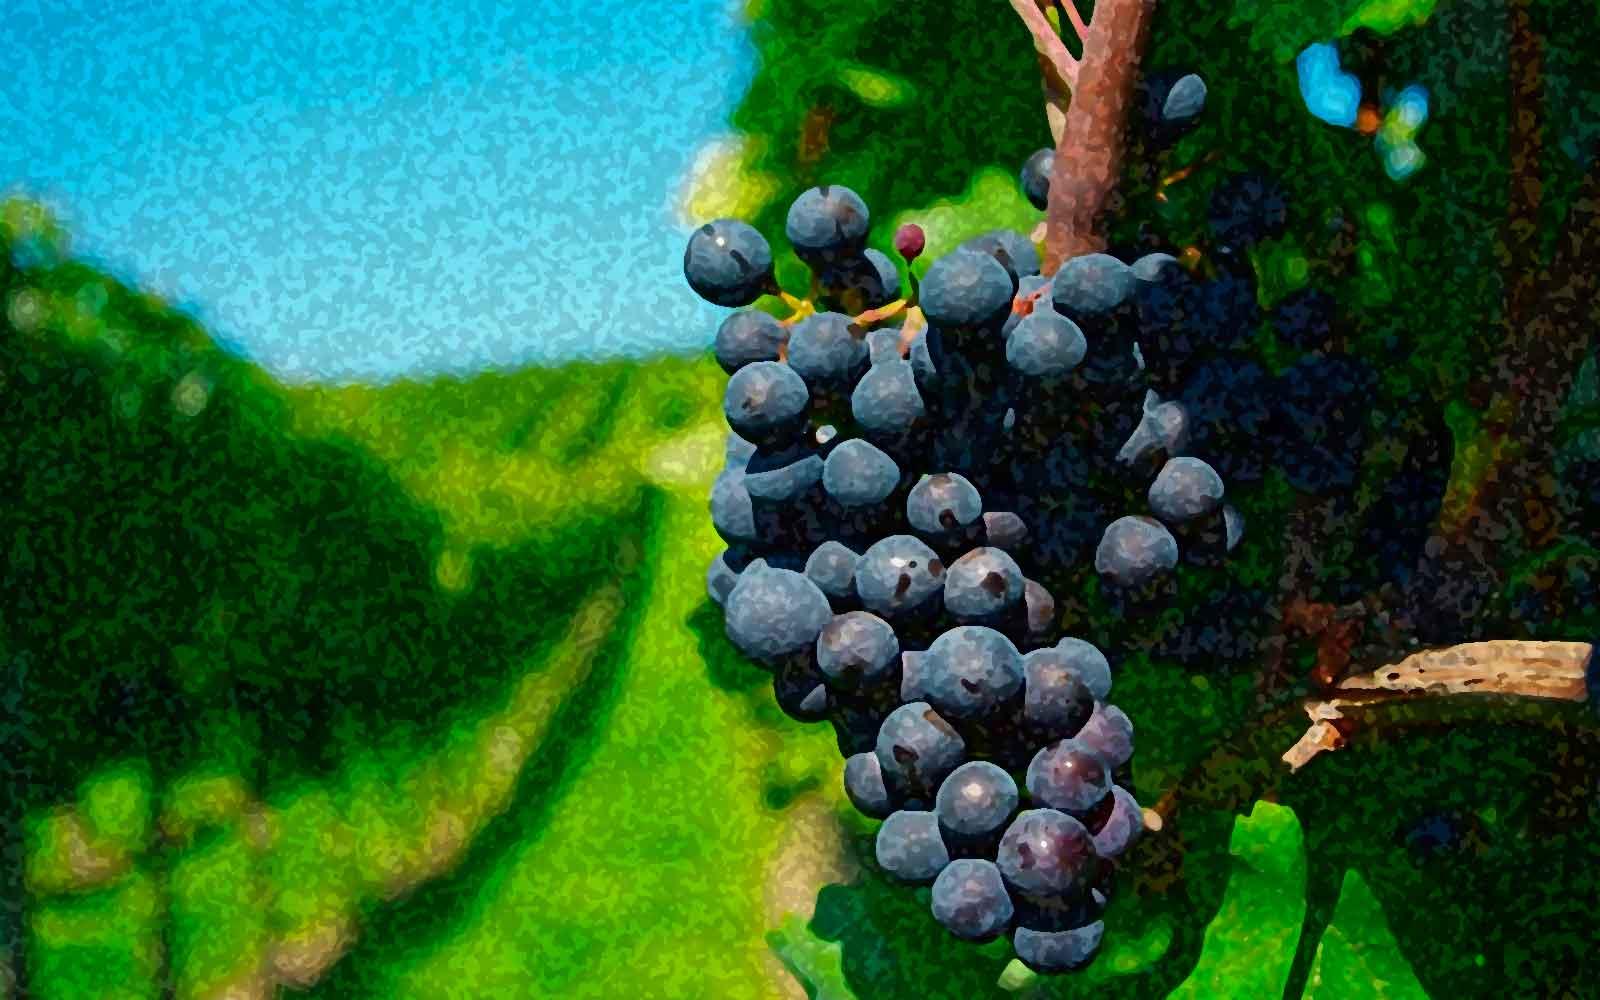 Frases sobre vino. Frases de personajes célebres.